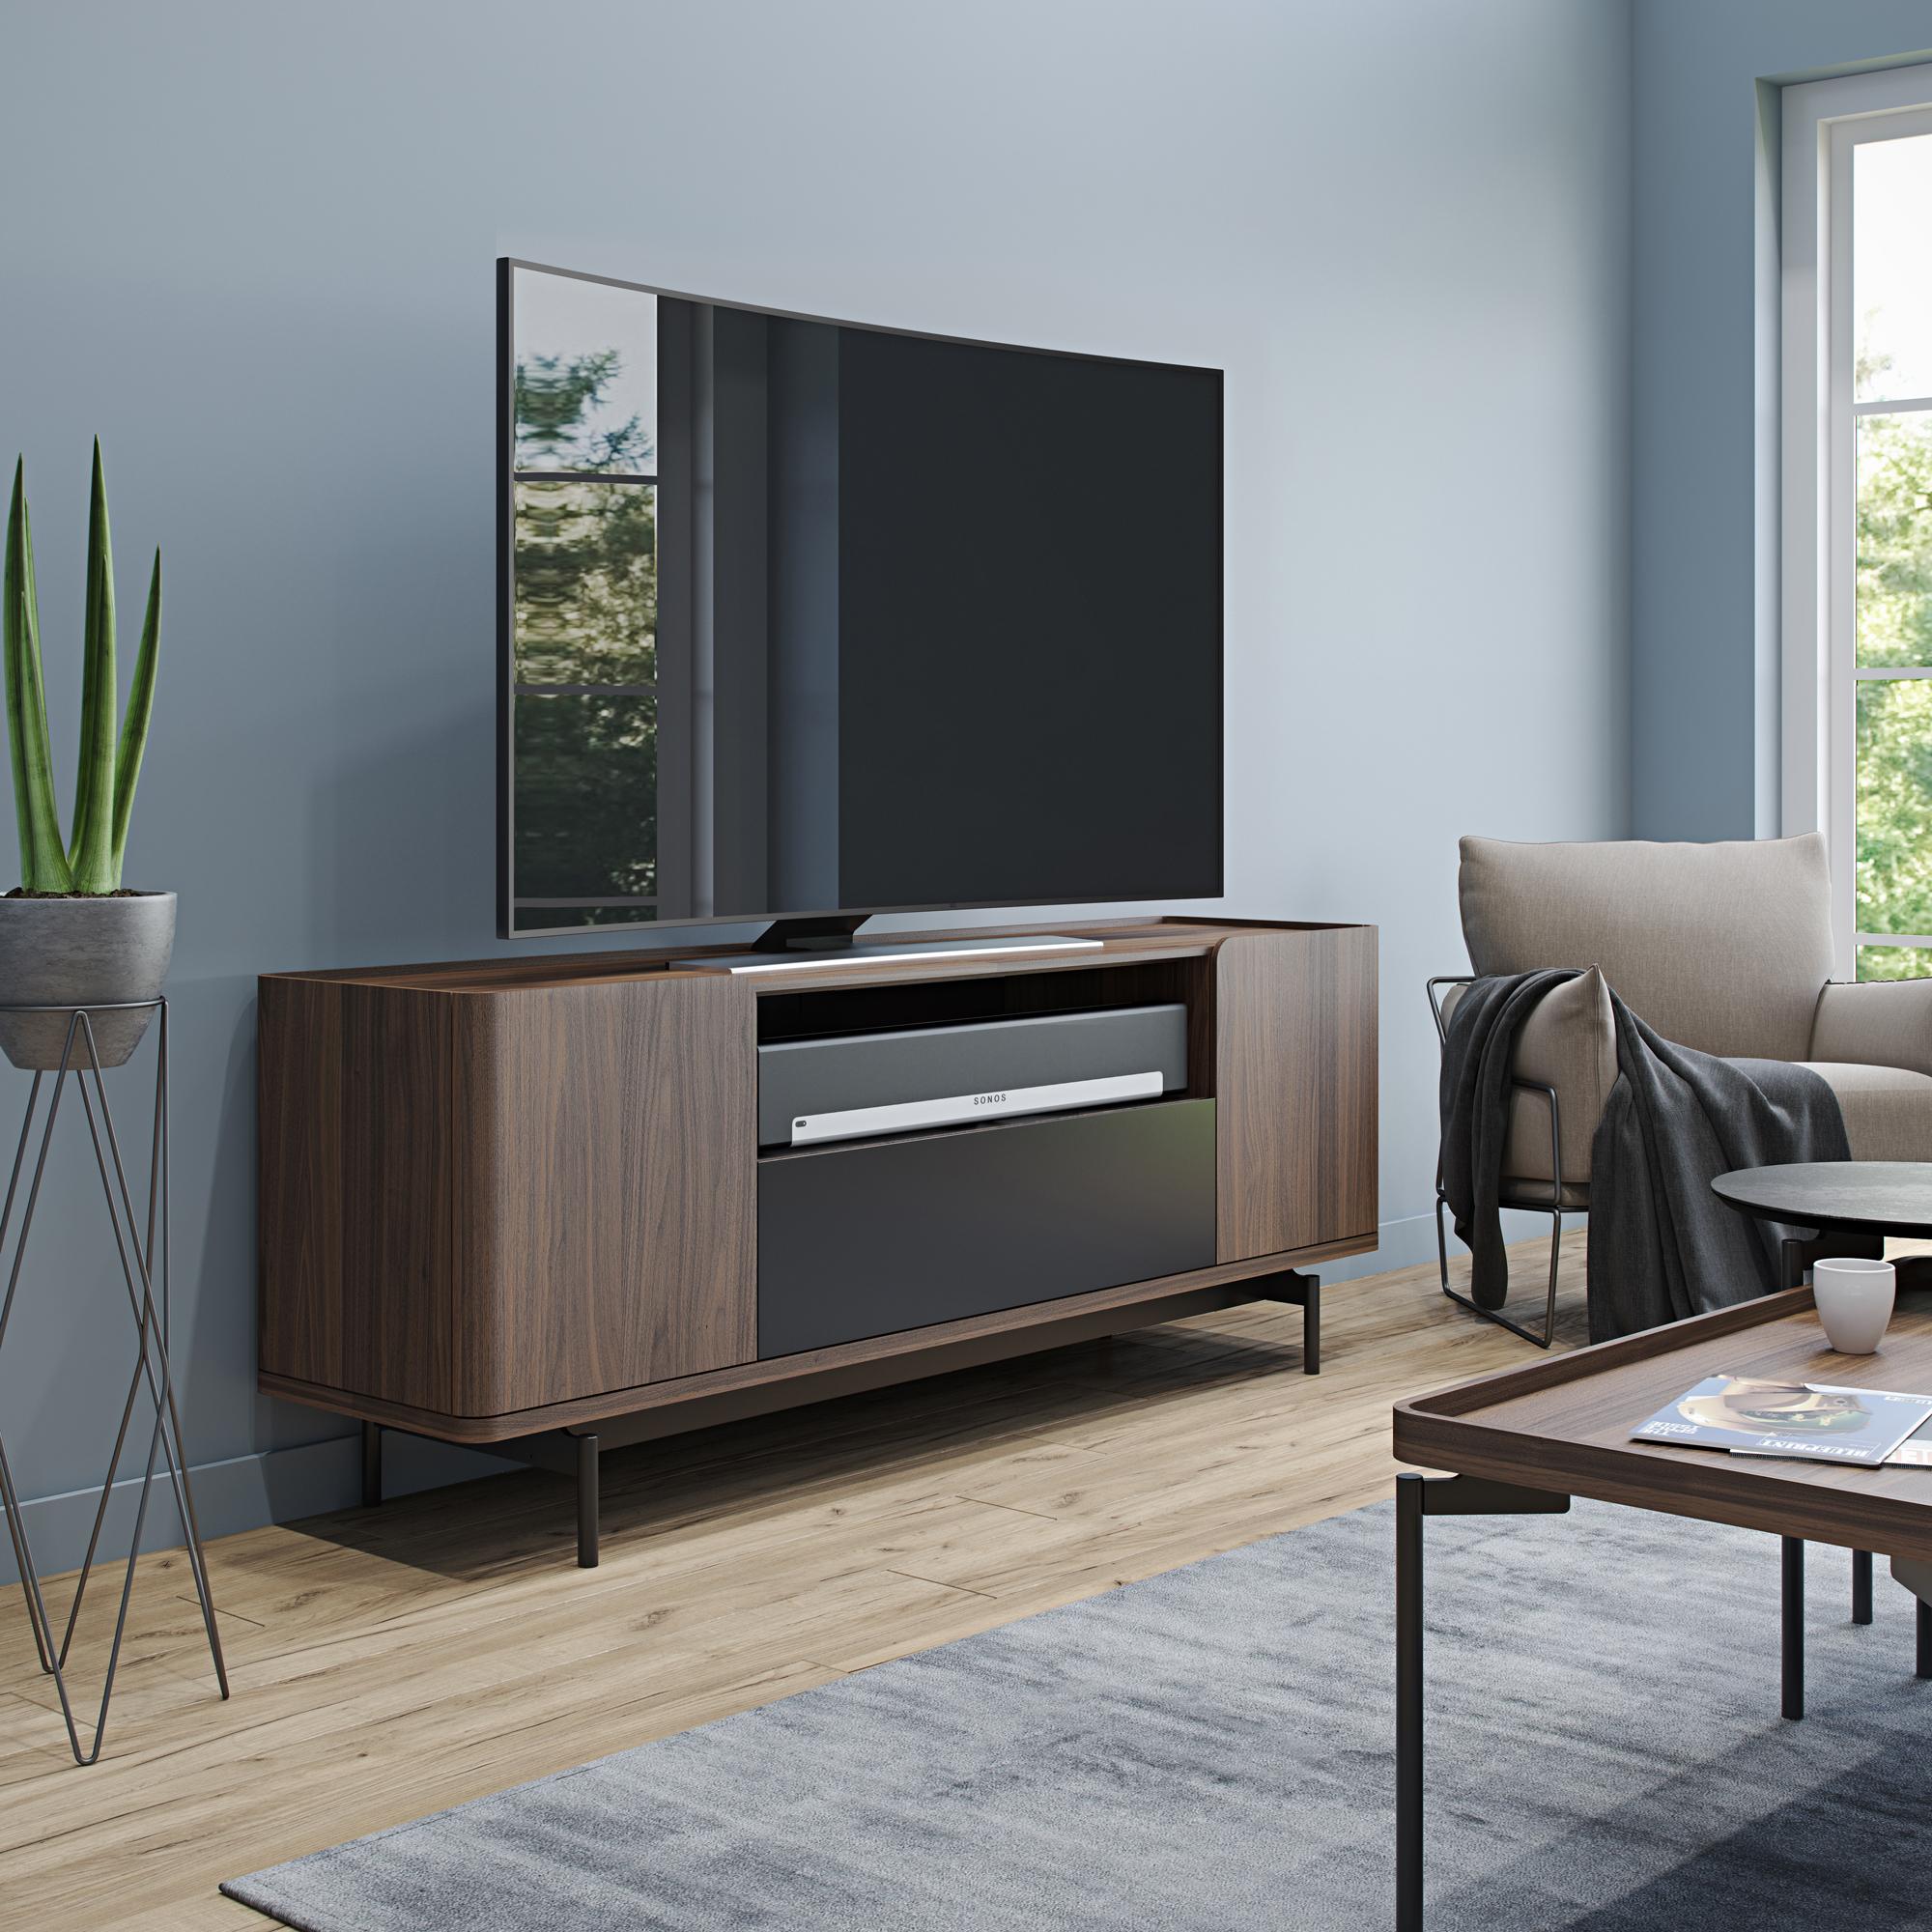 sequel cupboard furniture ladiff standing wl desk bdi project lift